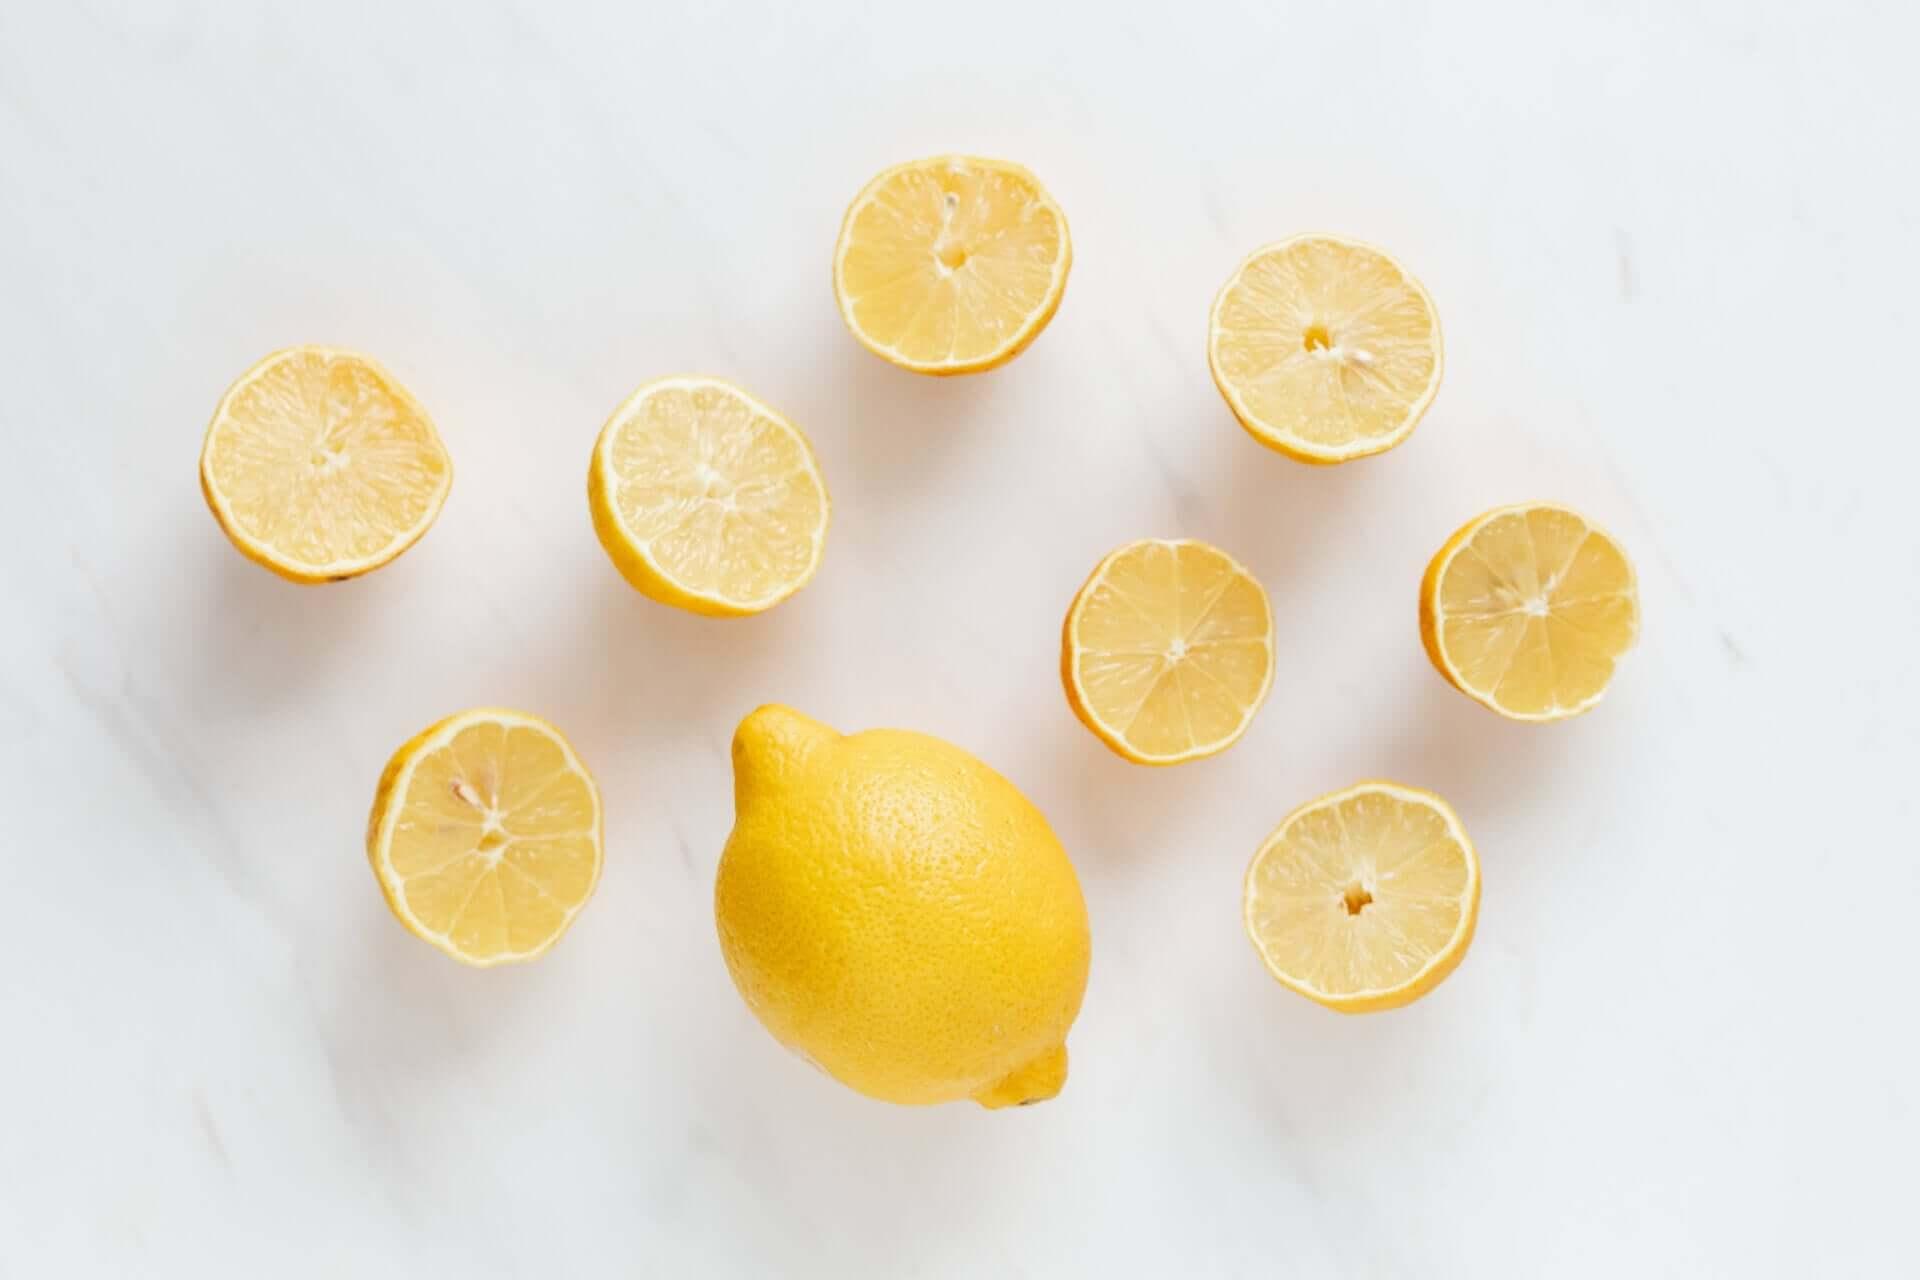 Several lemons cut in half.